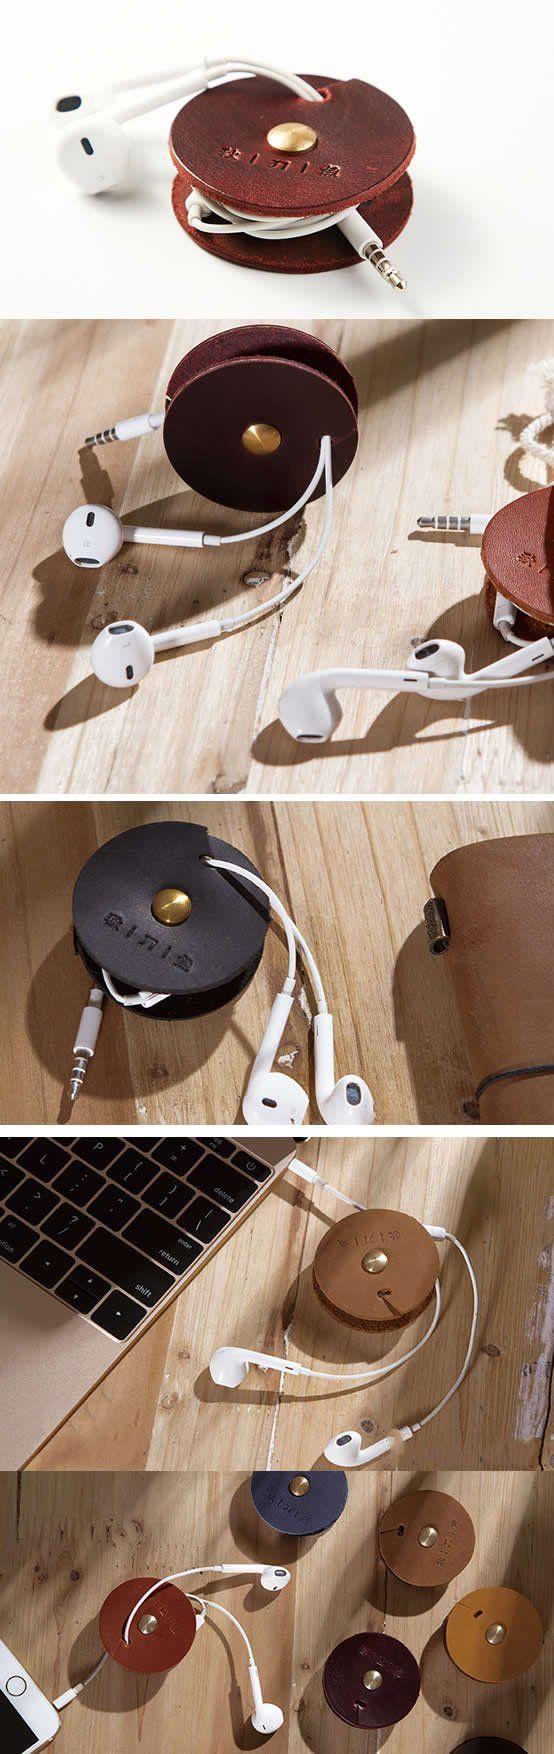 Leather Headset Headphone Earphone Wrap Winder Cable Cord Organizer Holder